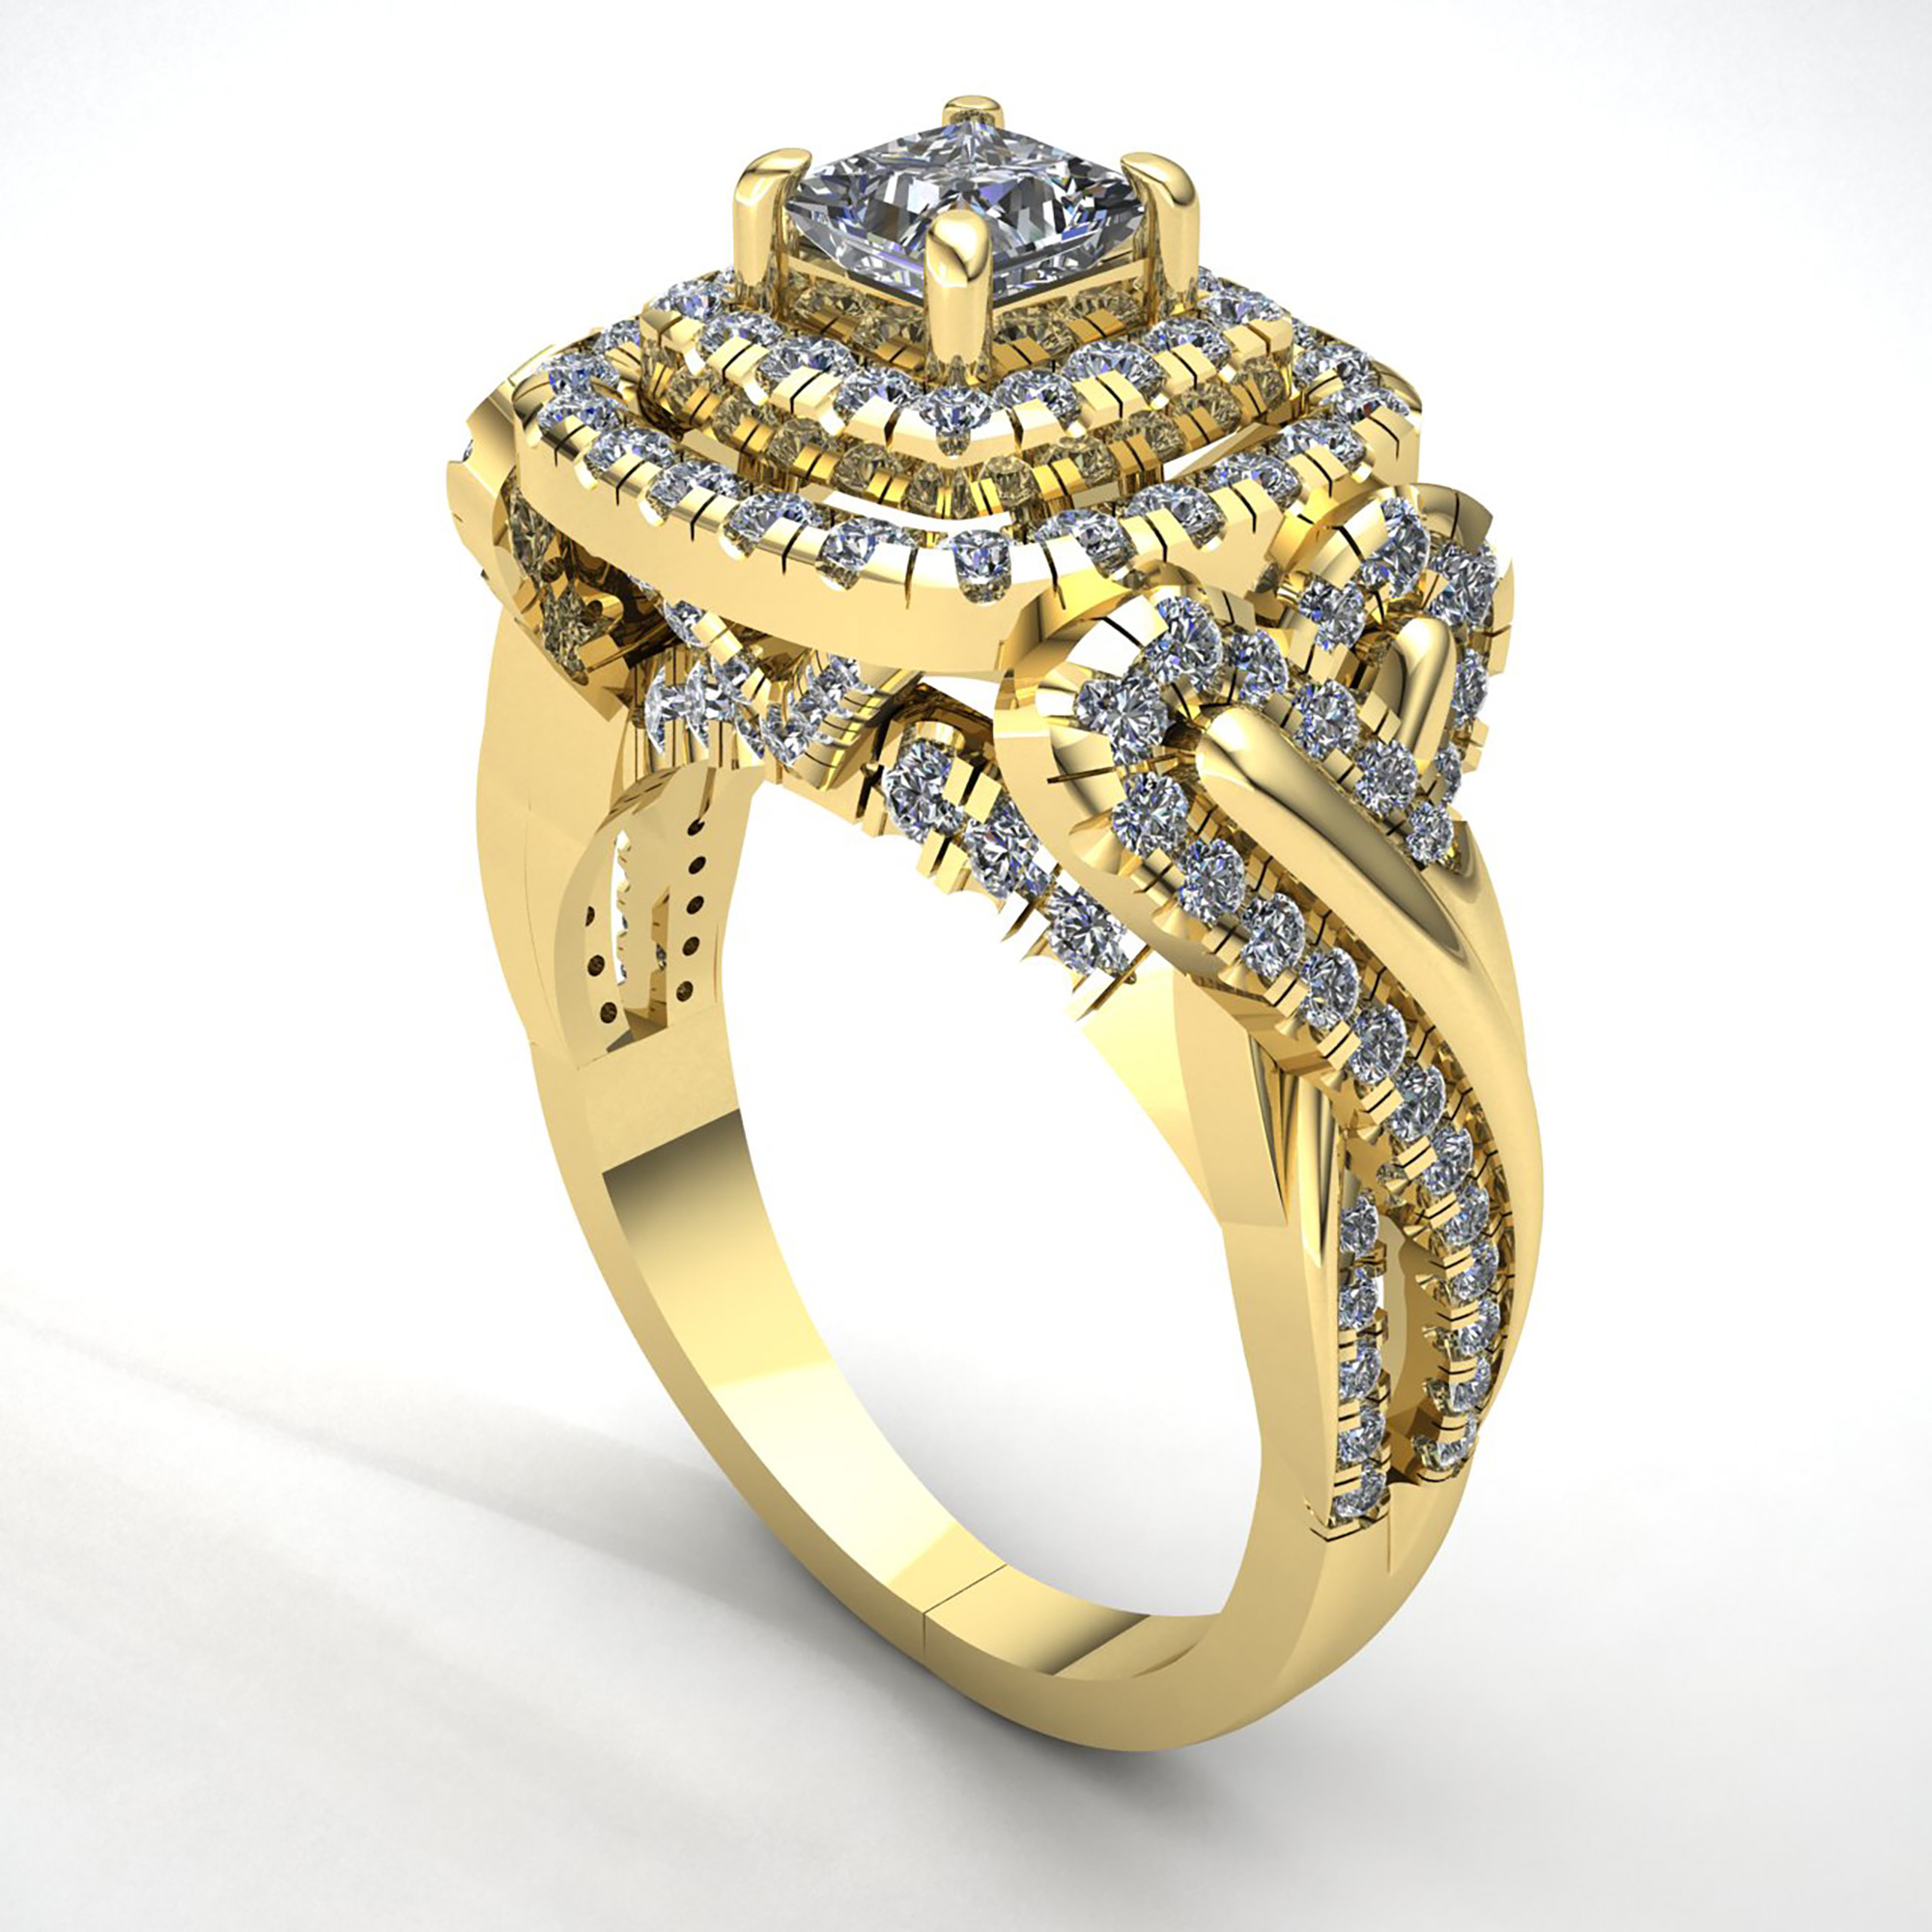 Natural-3-Quilates-Diamante-Talla-Princesa-Mujer-Doble-Halo-Anillo-de-Compromiso miniatura 13